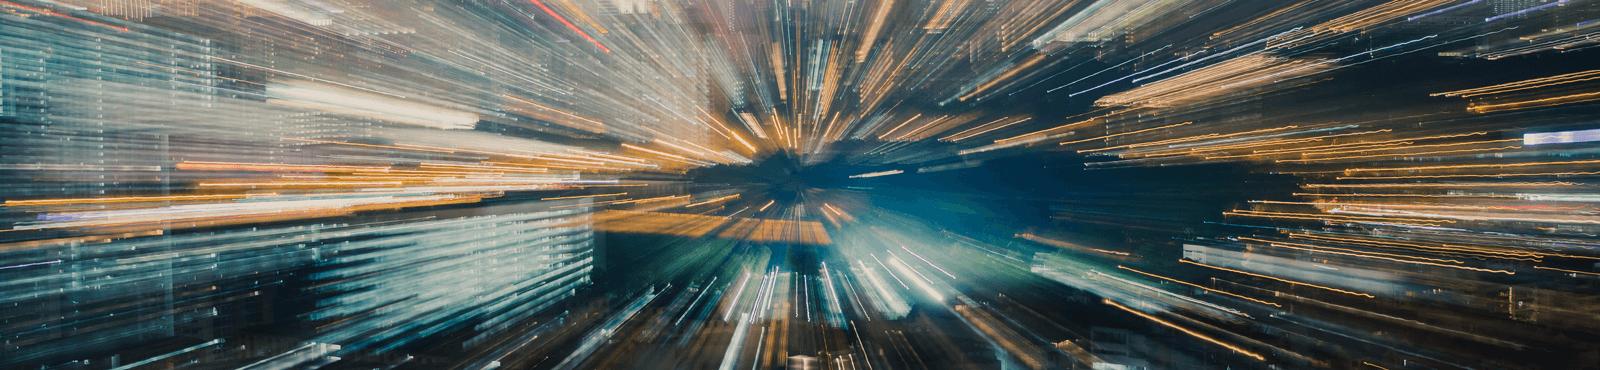 MeinBüro 2018: Flott, vielseitig & flexibel